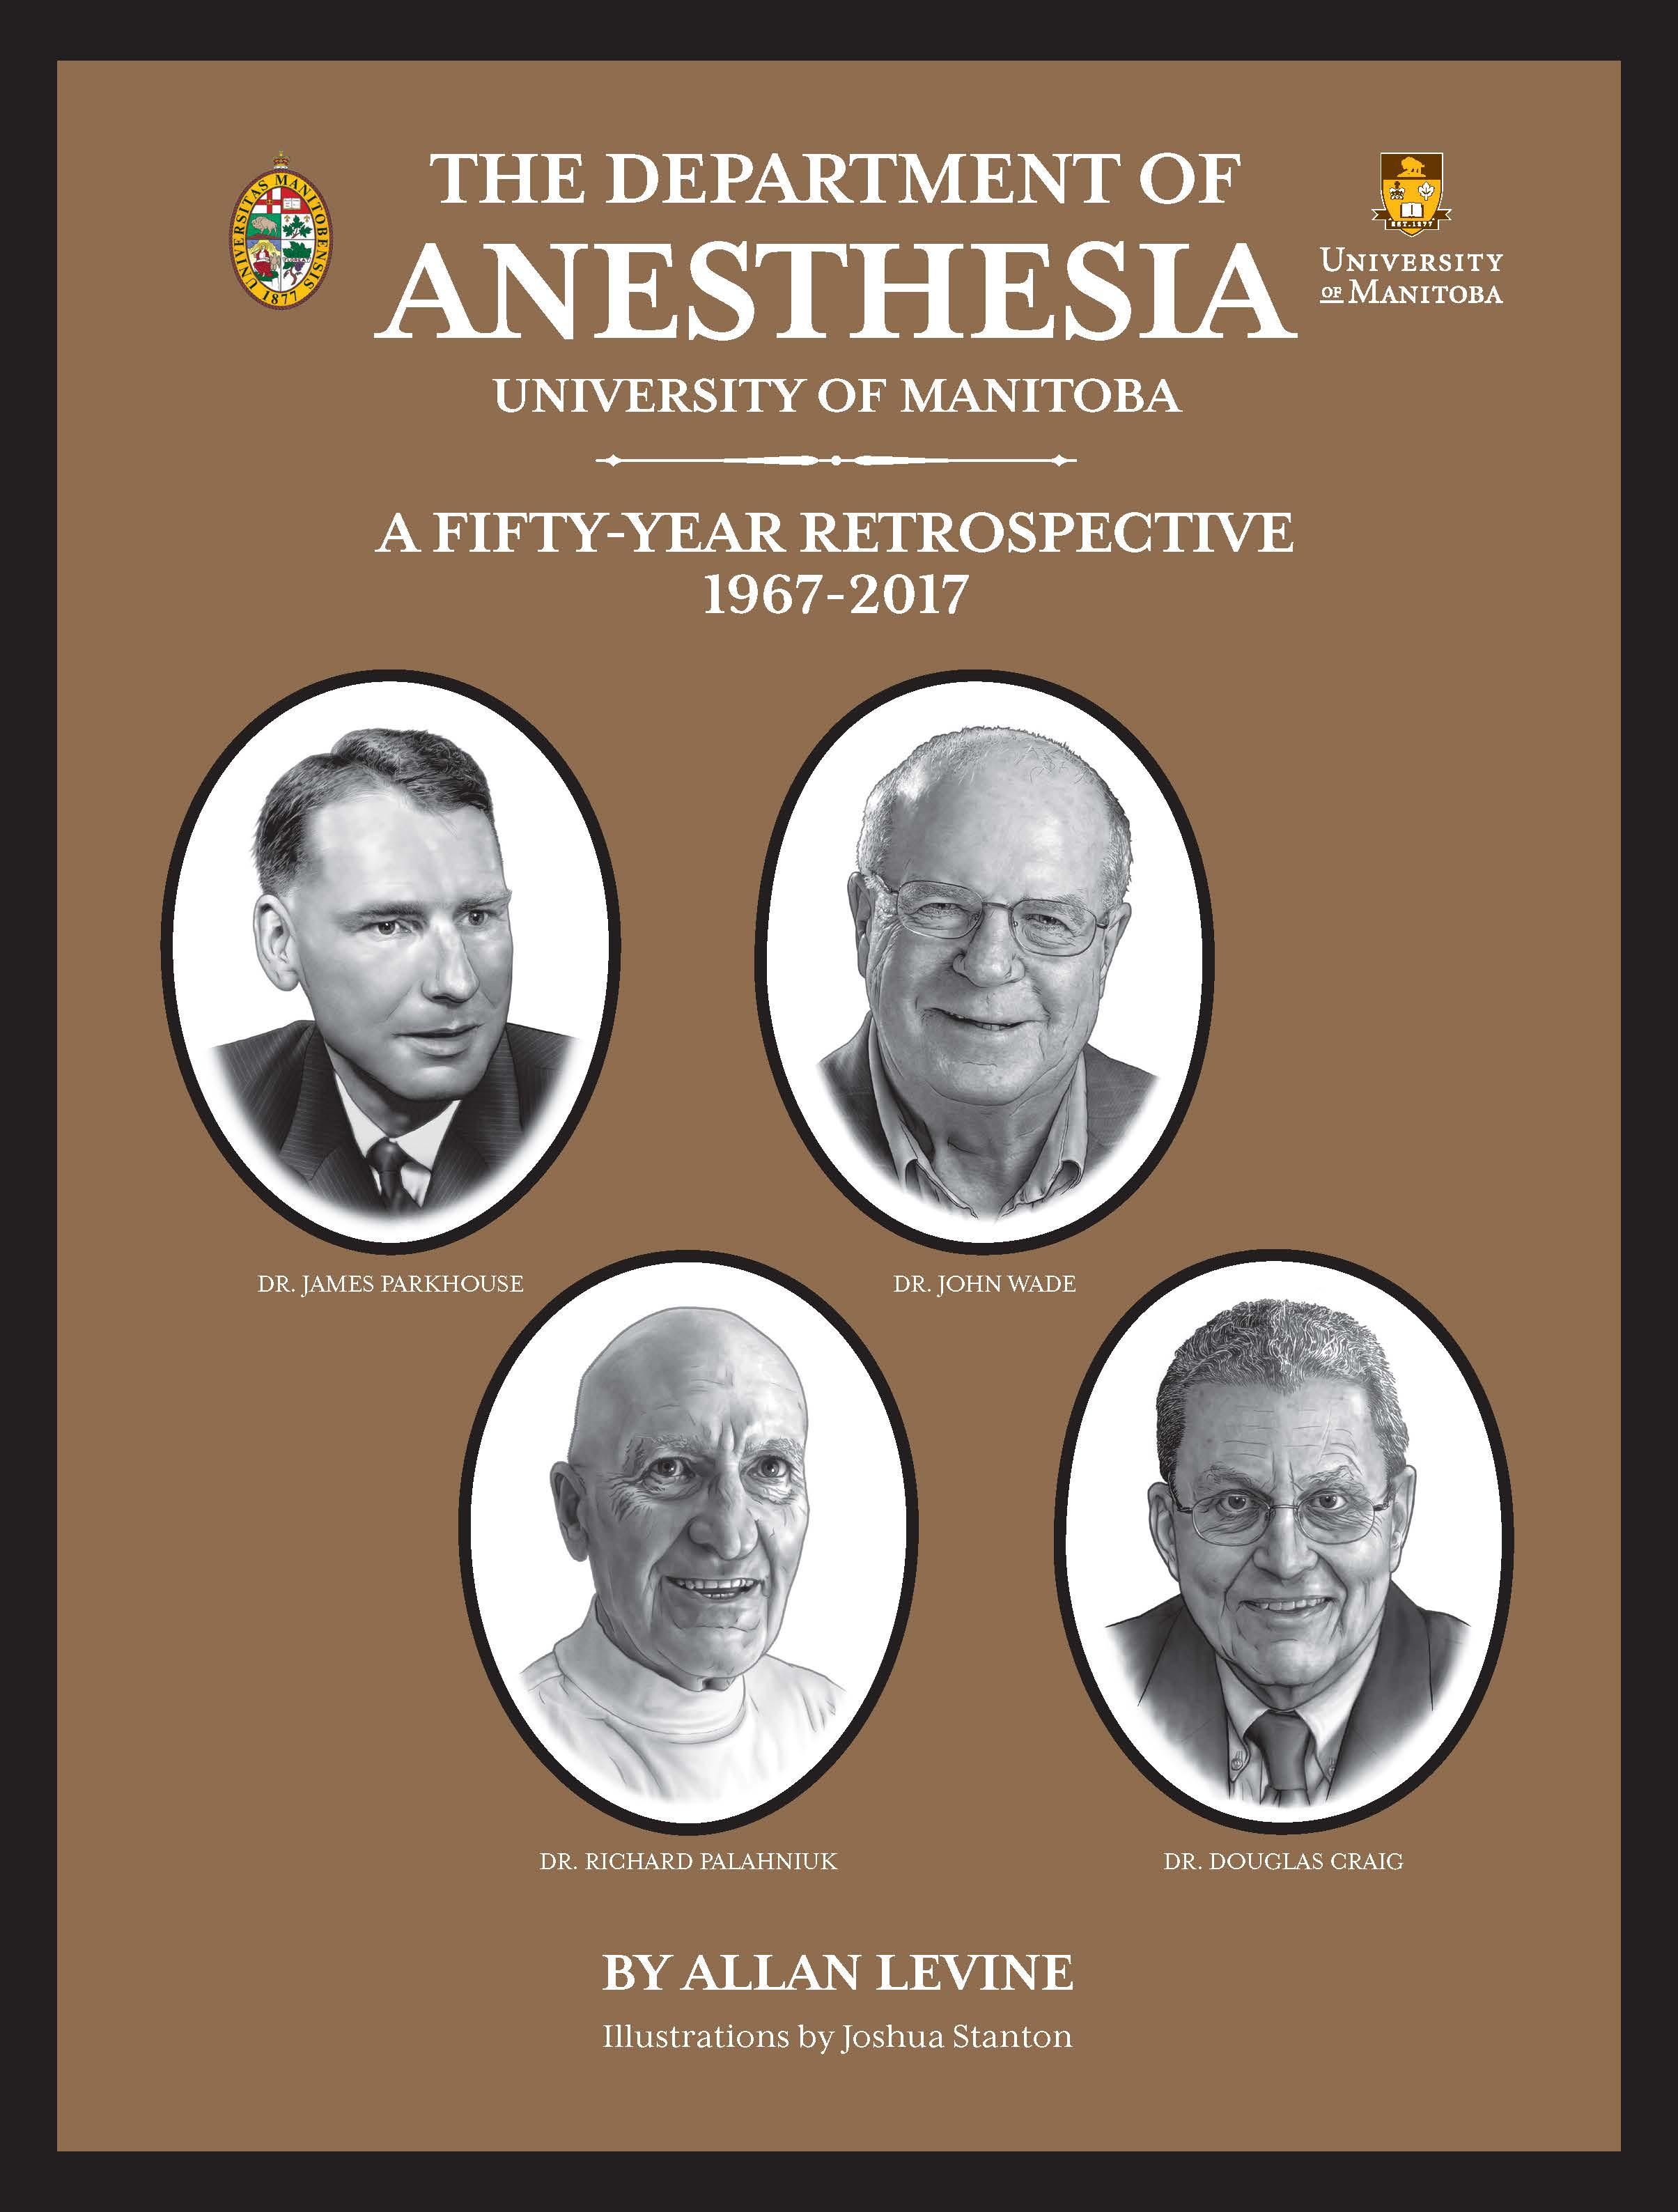 UofM_Anesthesia50Yr_Cover-NewsL.jpg